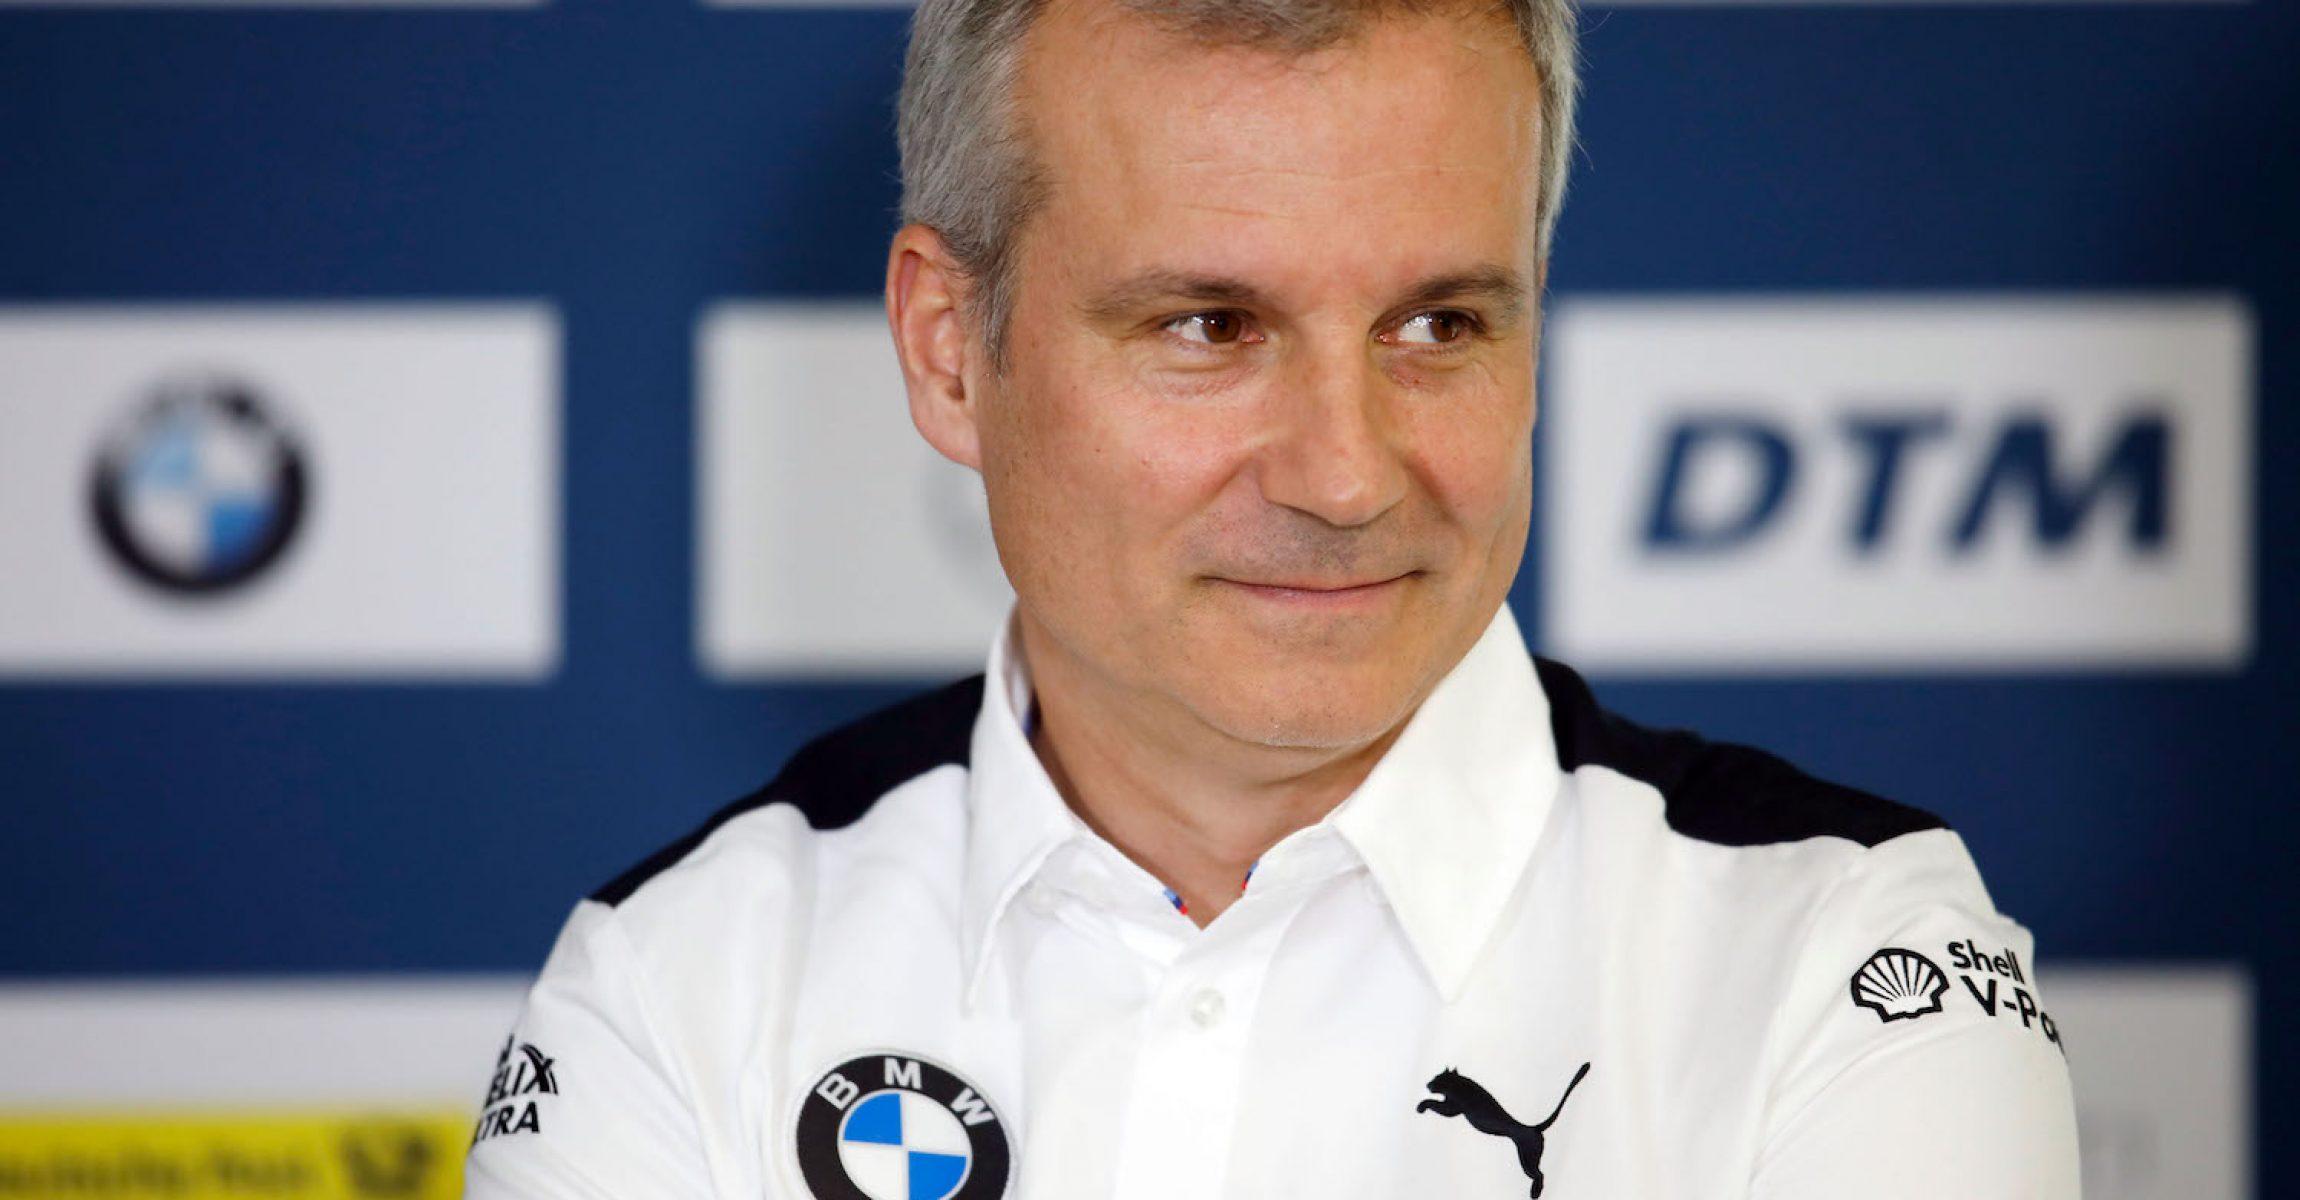 Fotó: BMW Motorsport